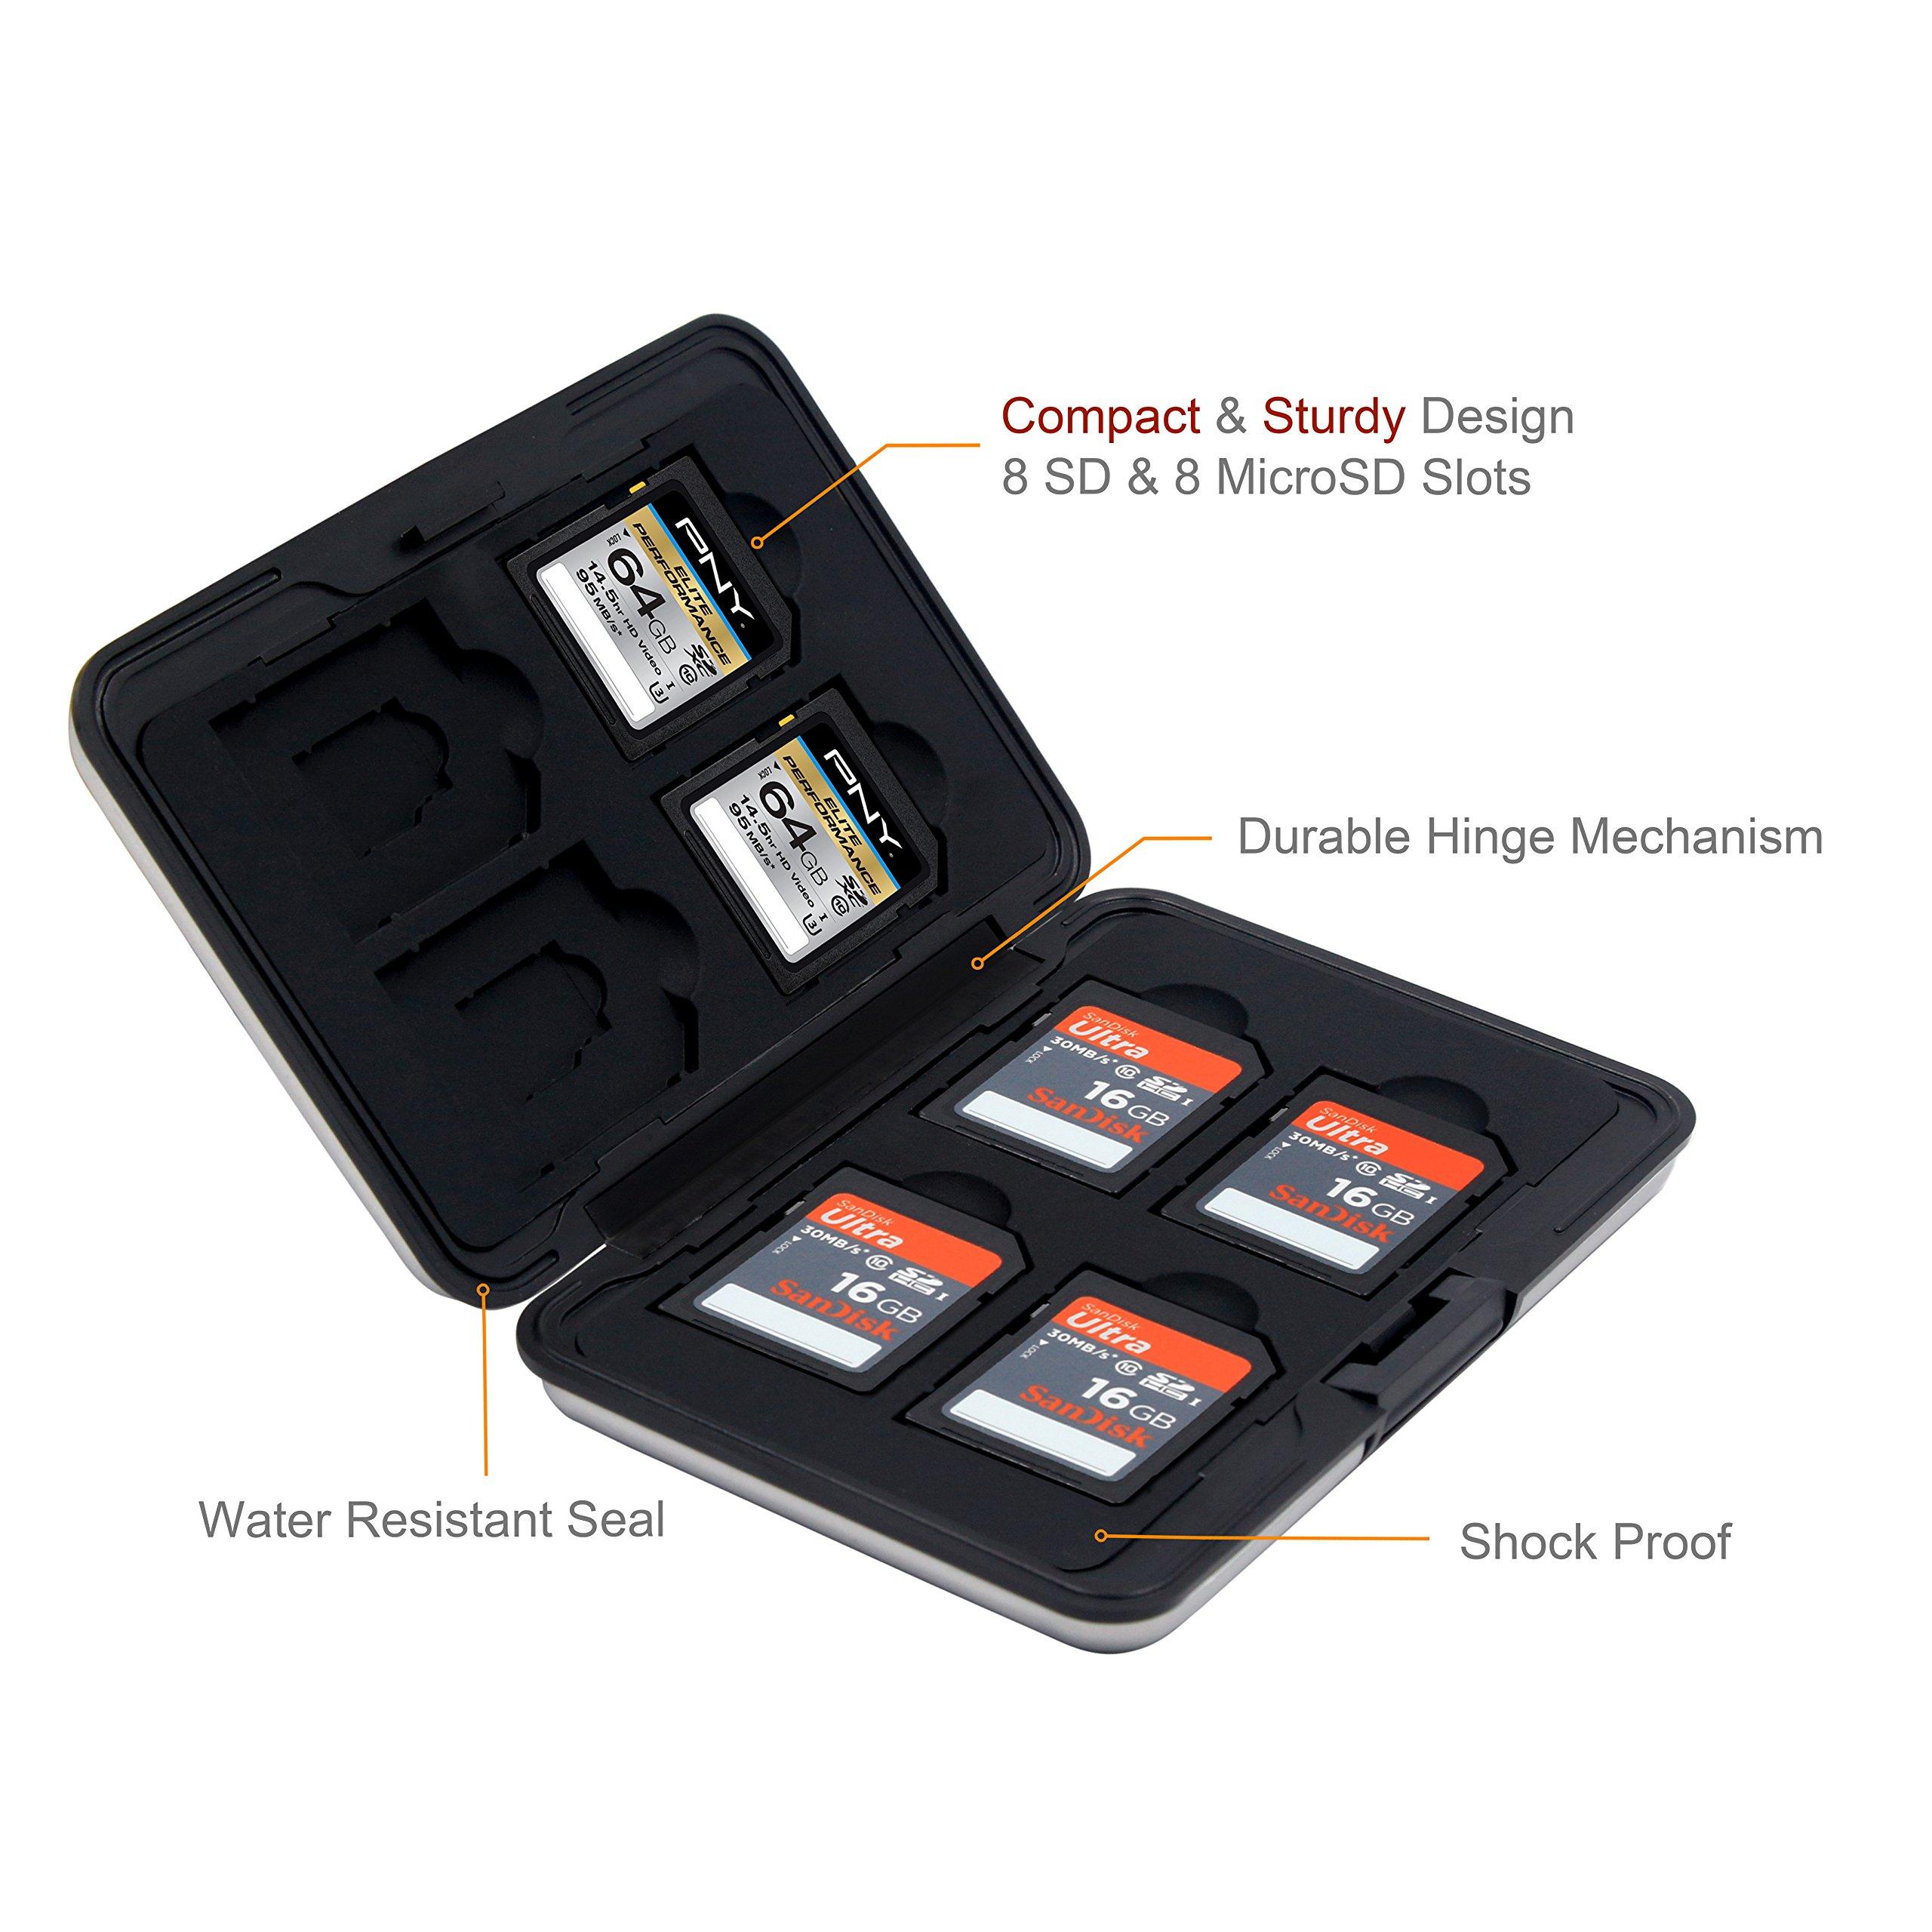 Honsky 2 Set Aluminum Water Resistant UHS-I SD Micro SD SDHC SDXC SecureDigital Memory Card Carrying Case Holder Organizer Box Keeper Computer Camera Media Storage Organization, Silver by Honsky (Image #2)